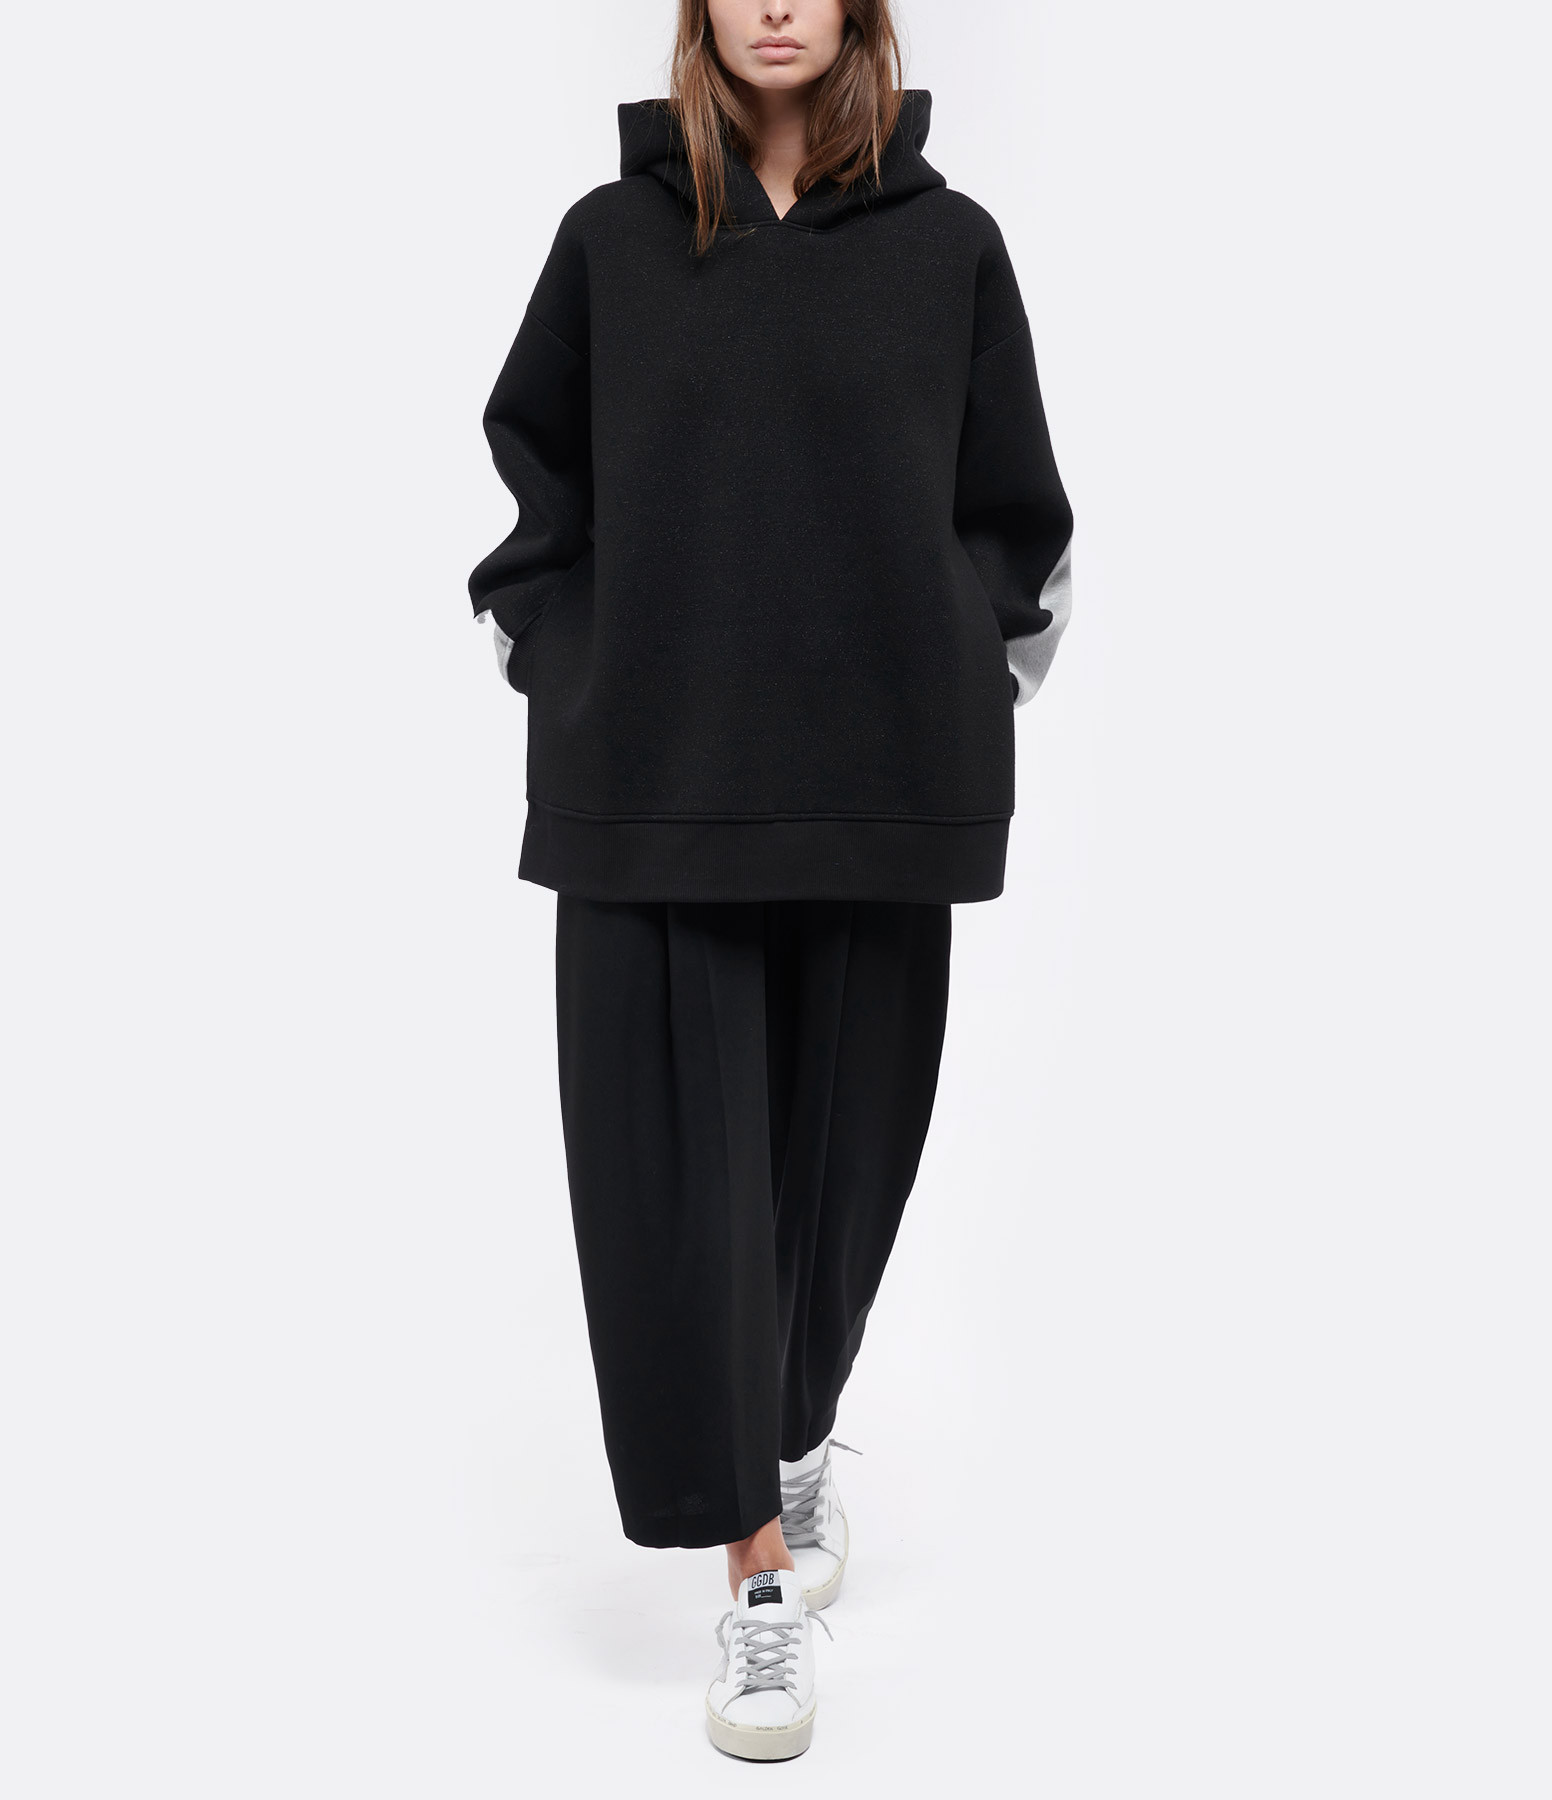 MM6 MAISON MARGIELA - Sweatshirt Oversize Gris Noir